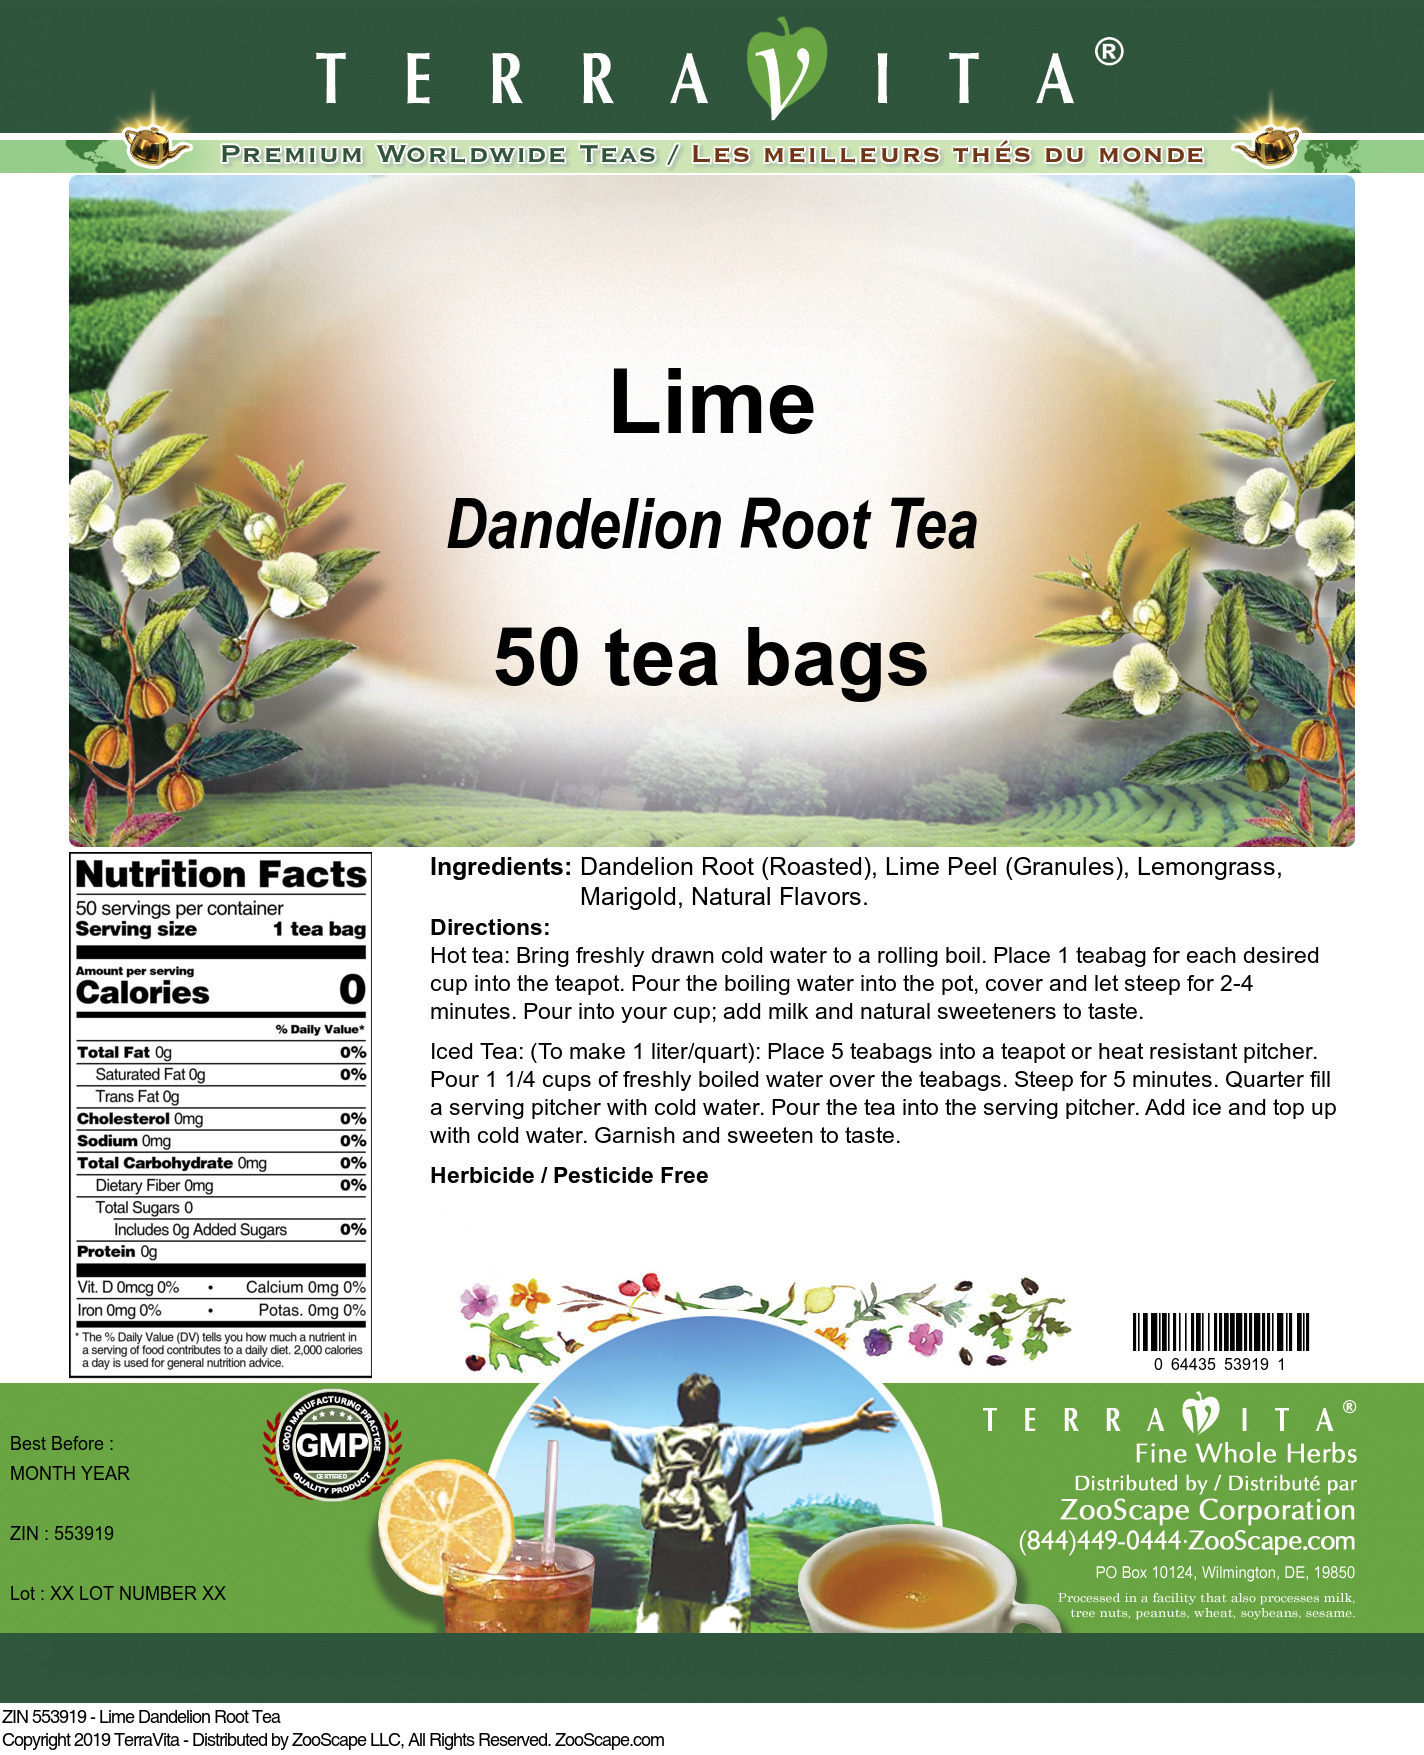 Lime Dandelion Root Tea